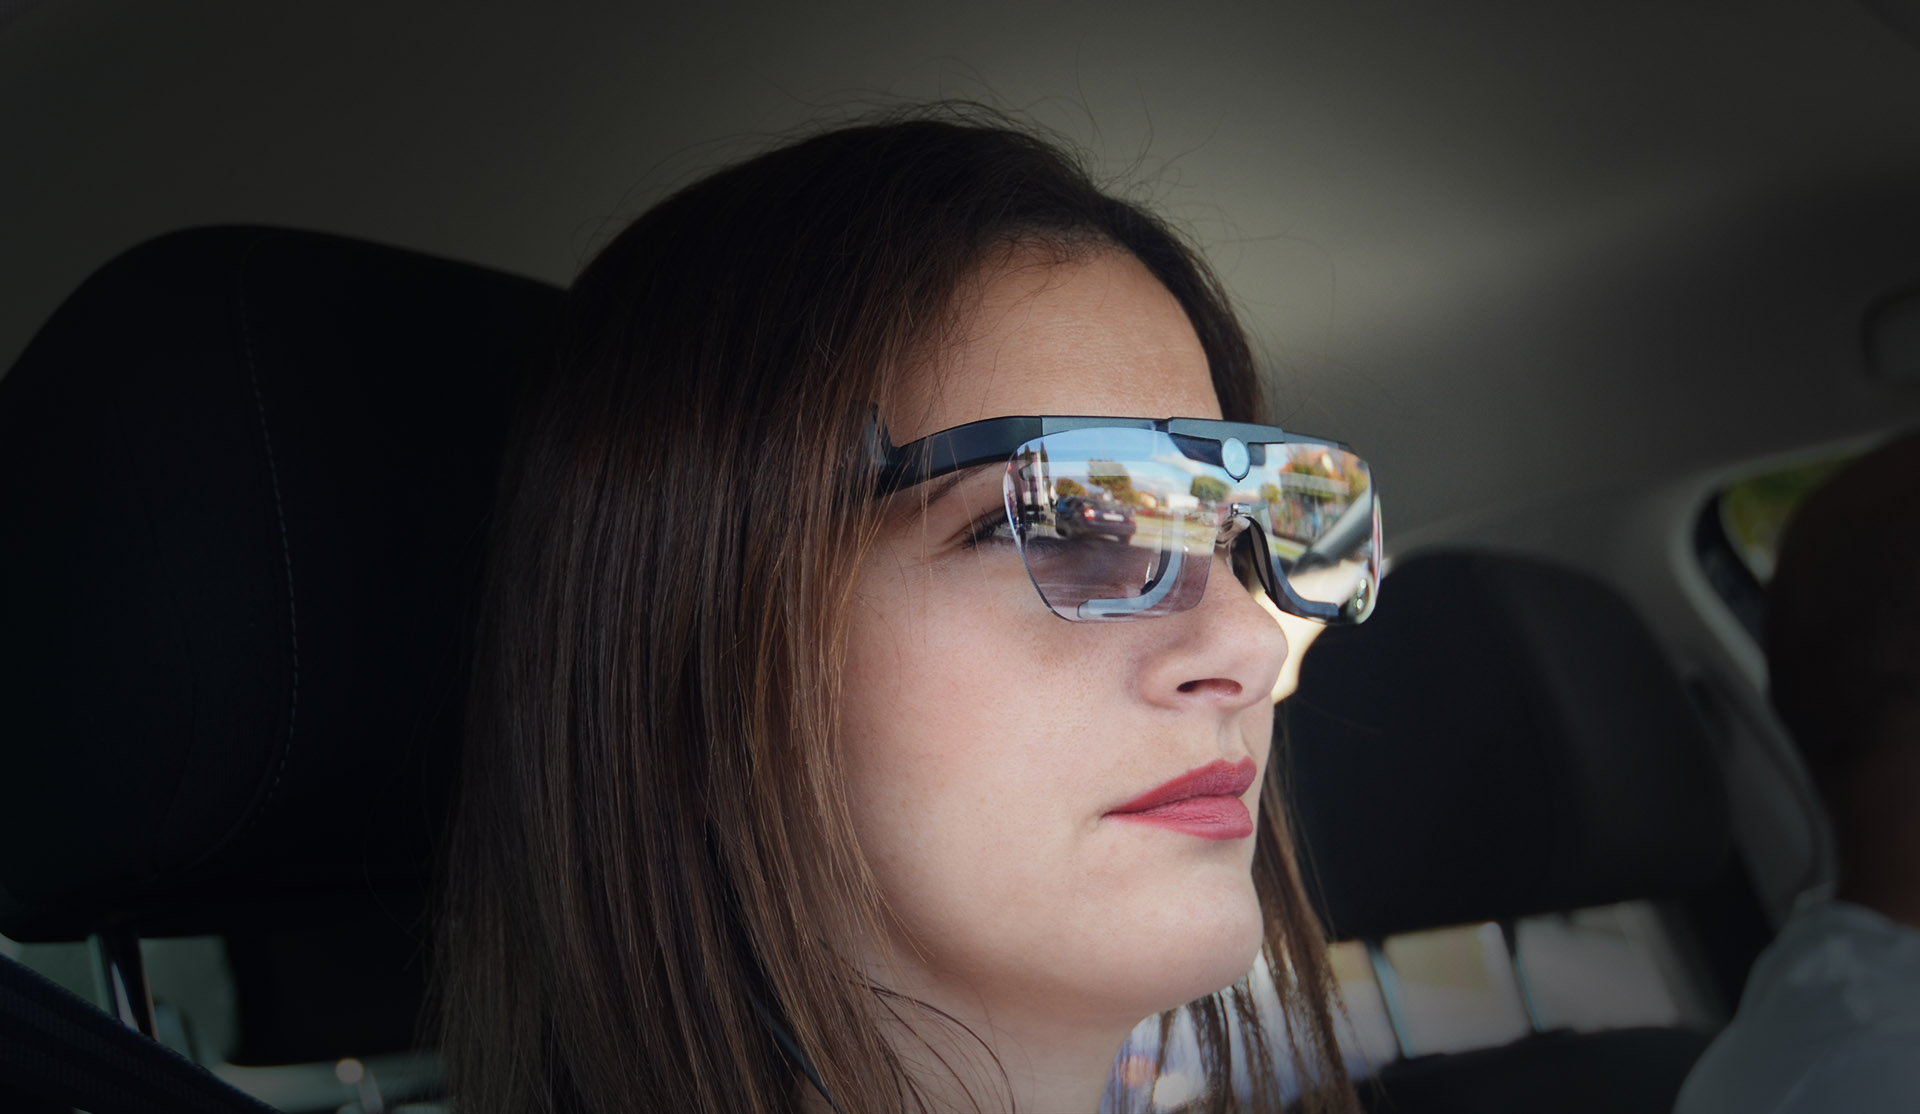 Eye -Tracking - Promosapiens - marketing evolution